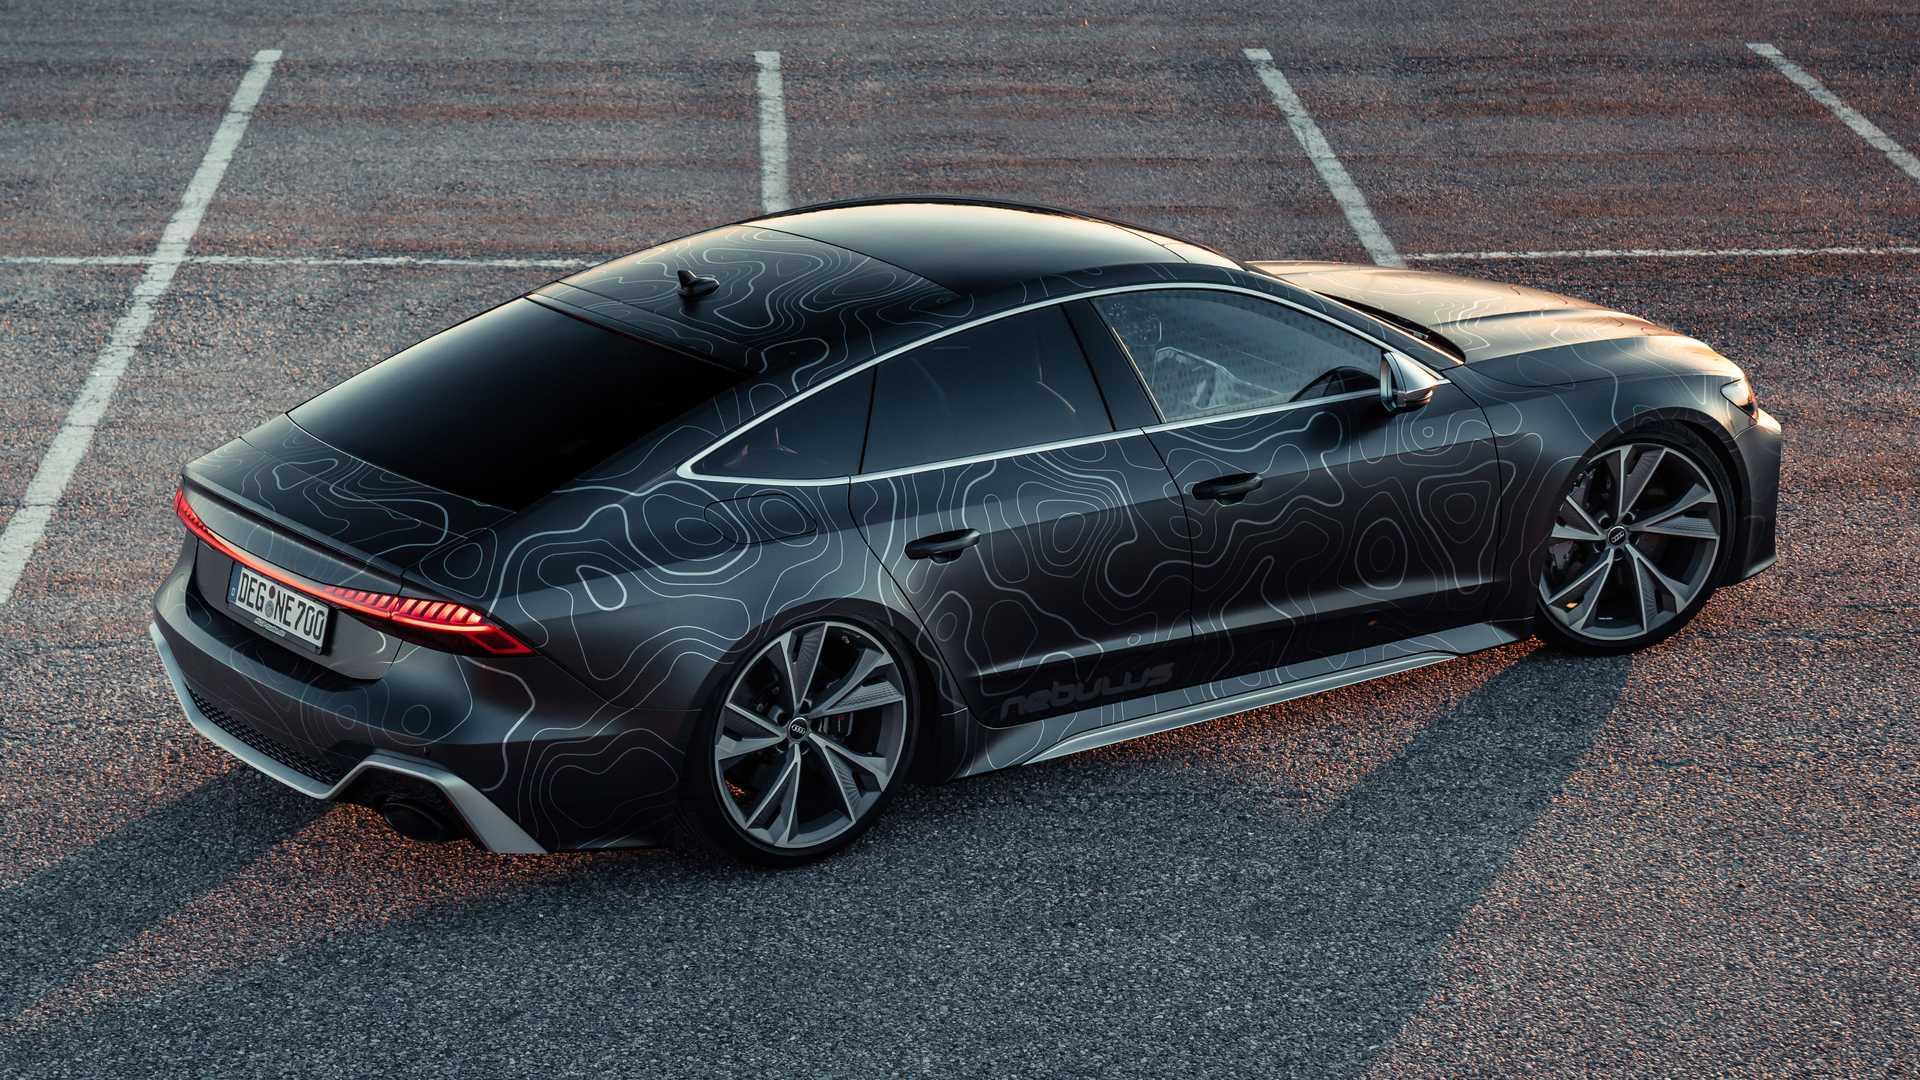 Audi-RS7-By-Black-Box-Richter-4